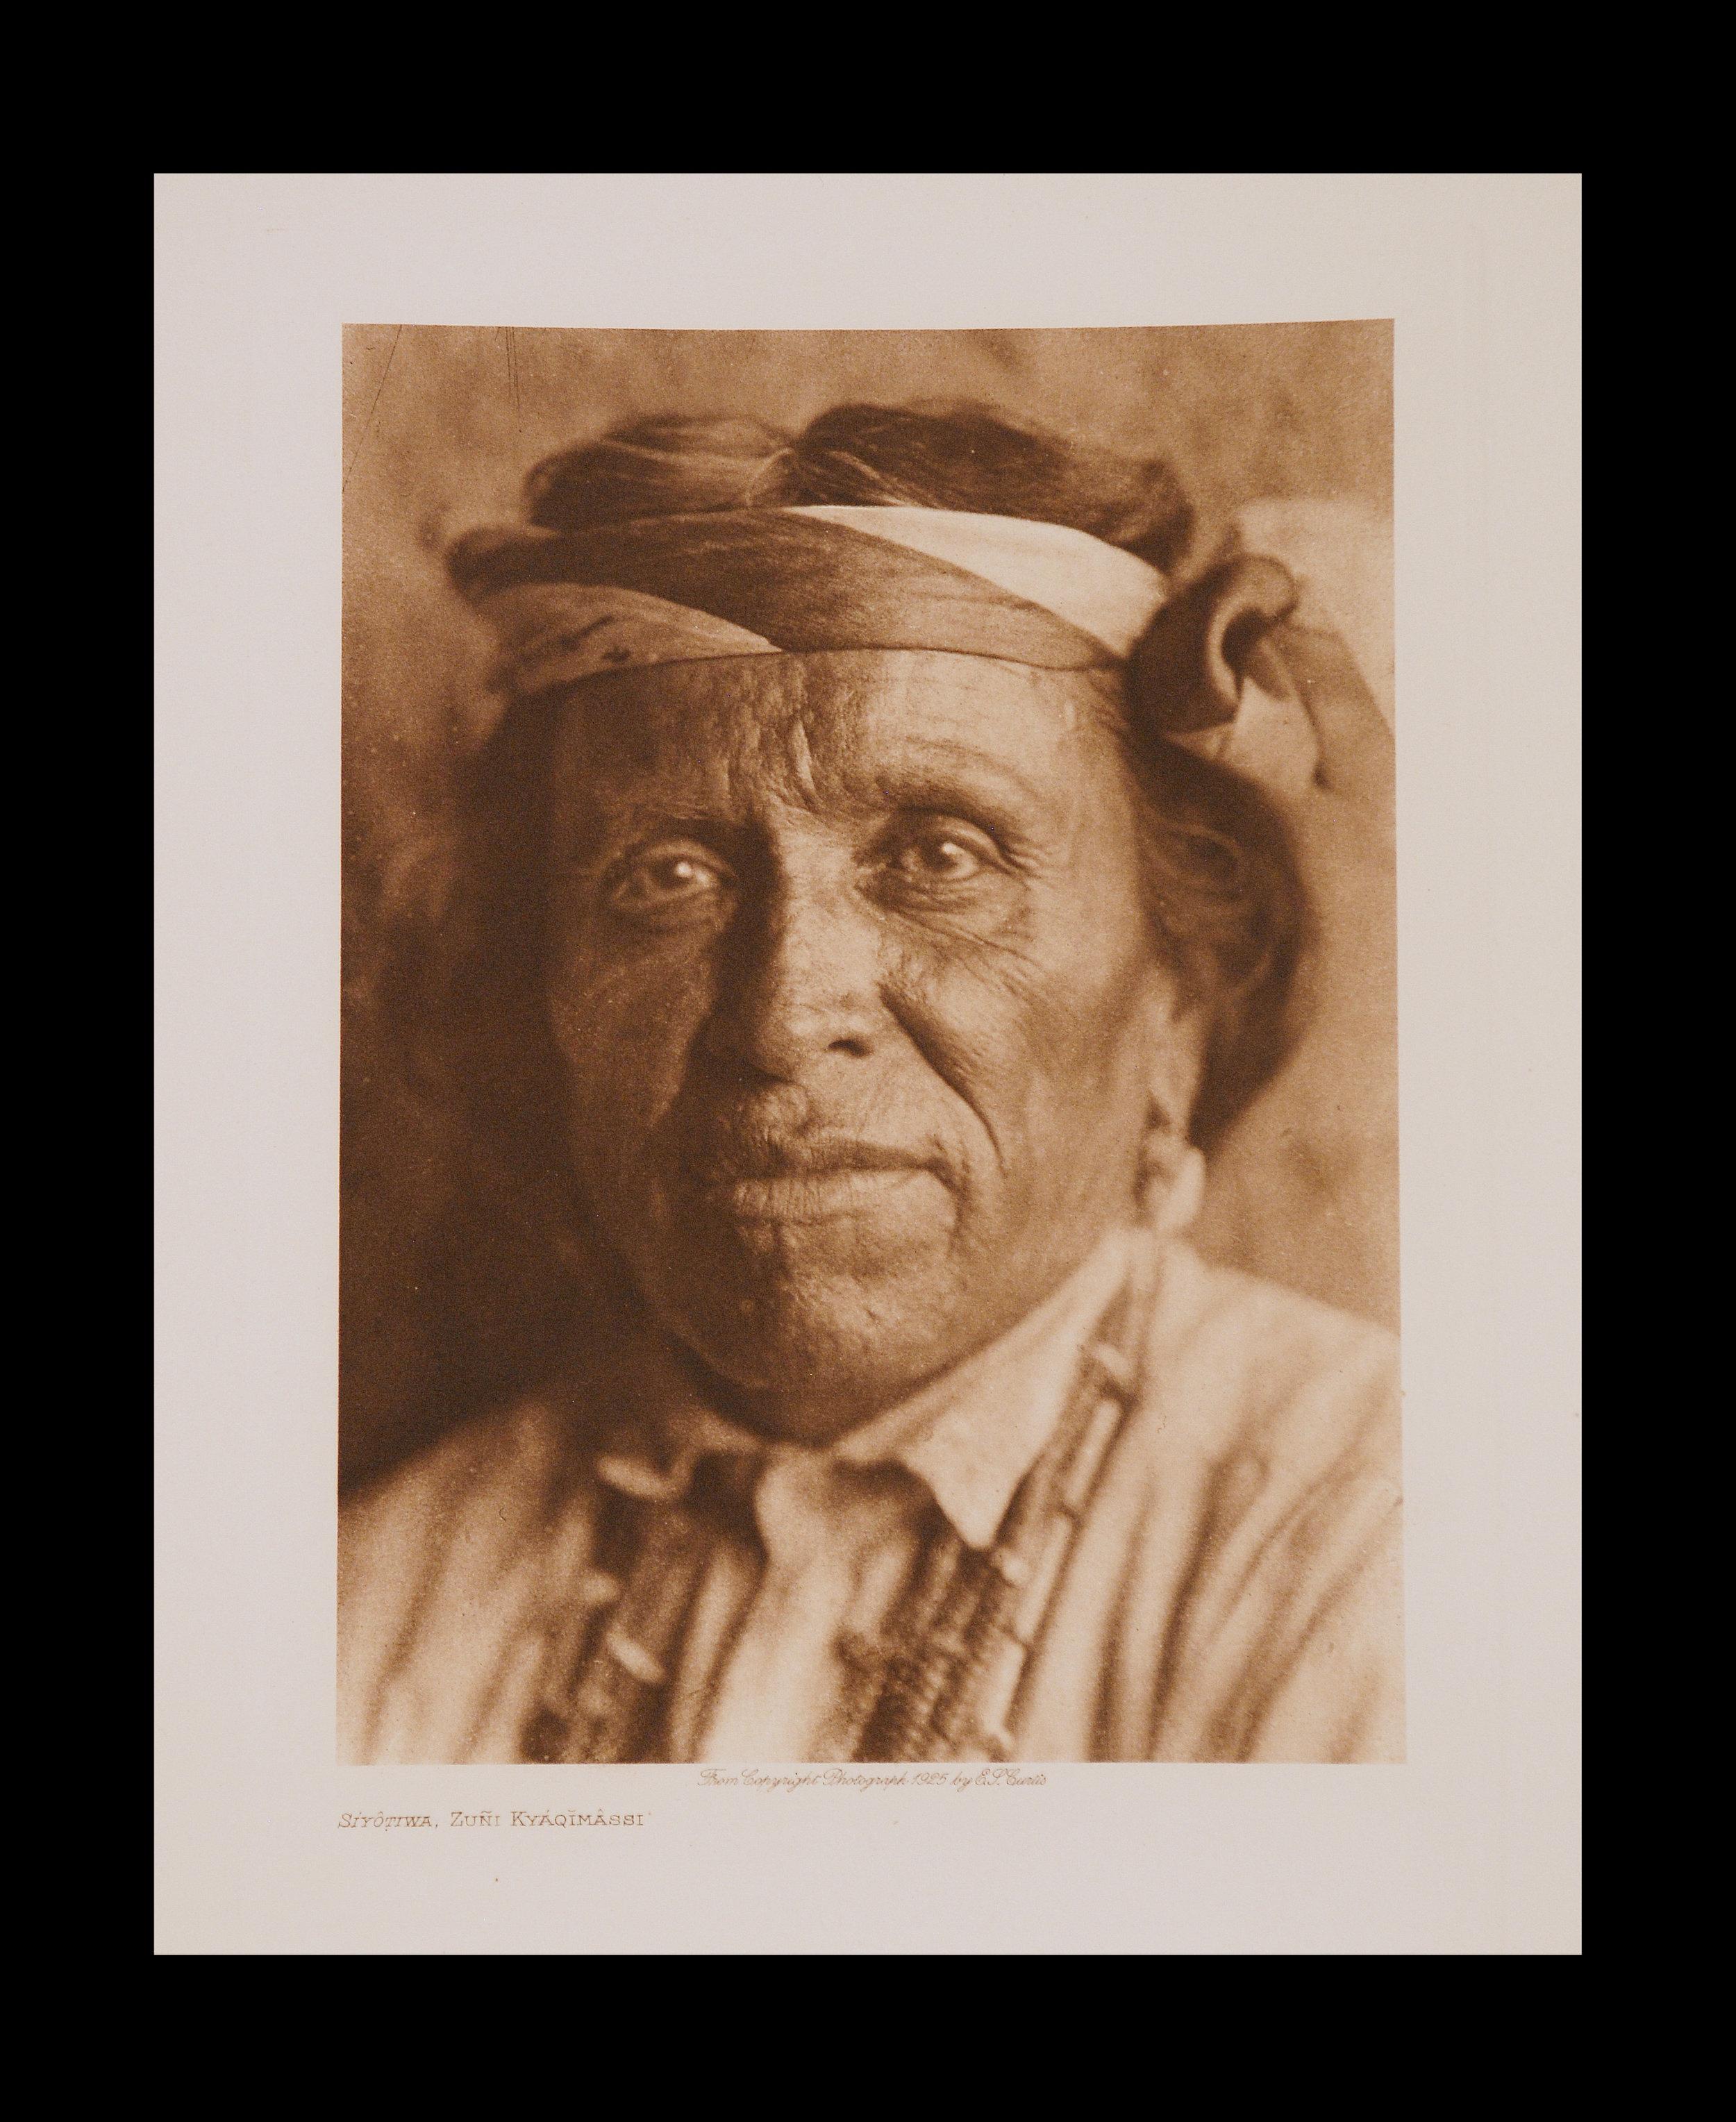 """Siyotiwa, Zuni Kyaqimassi"" 1925 Vol.17 Van Gelder Print Vintage Photogravure"